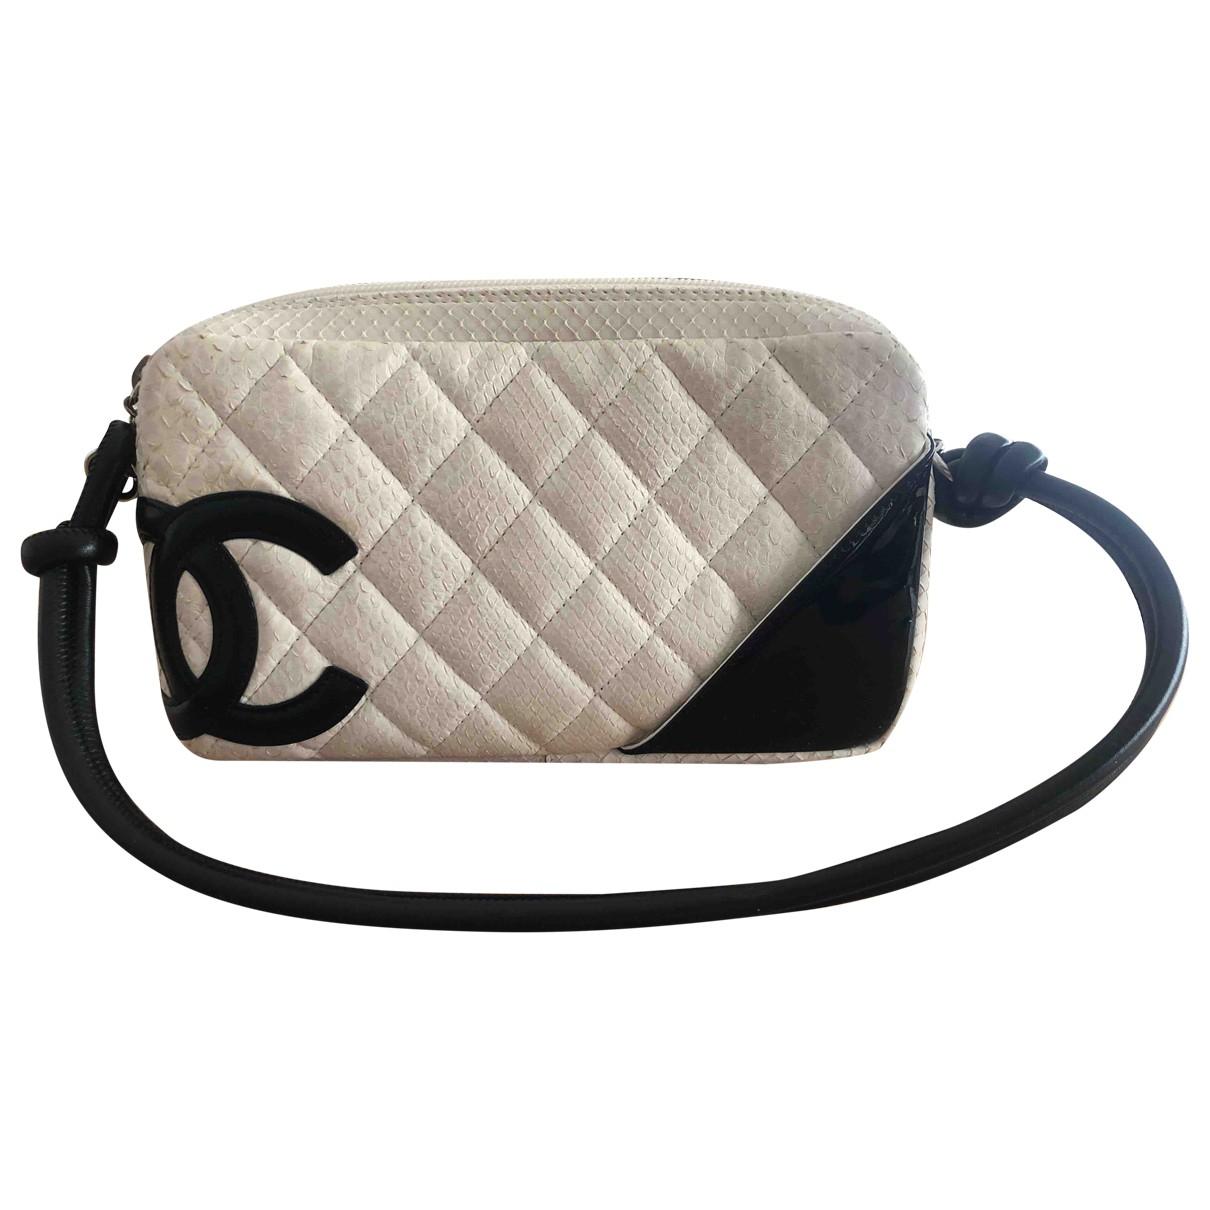 Chanel Cambon Clutch in  Weiss Python